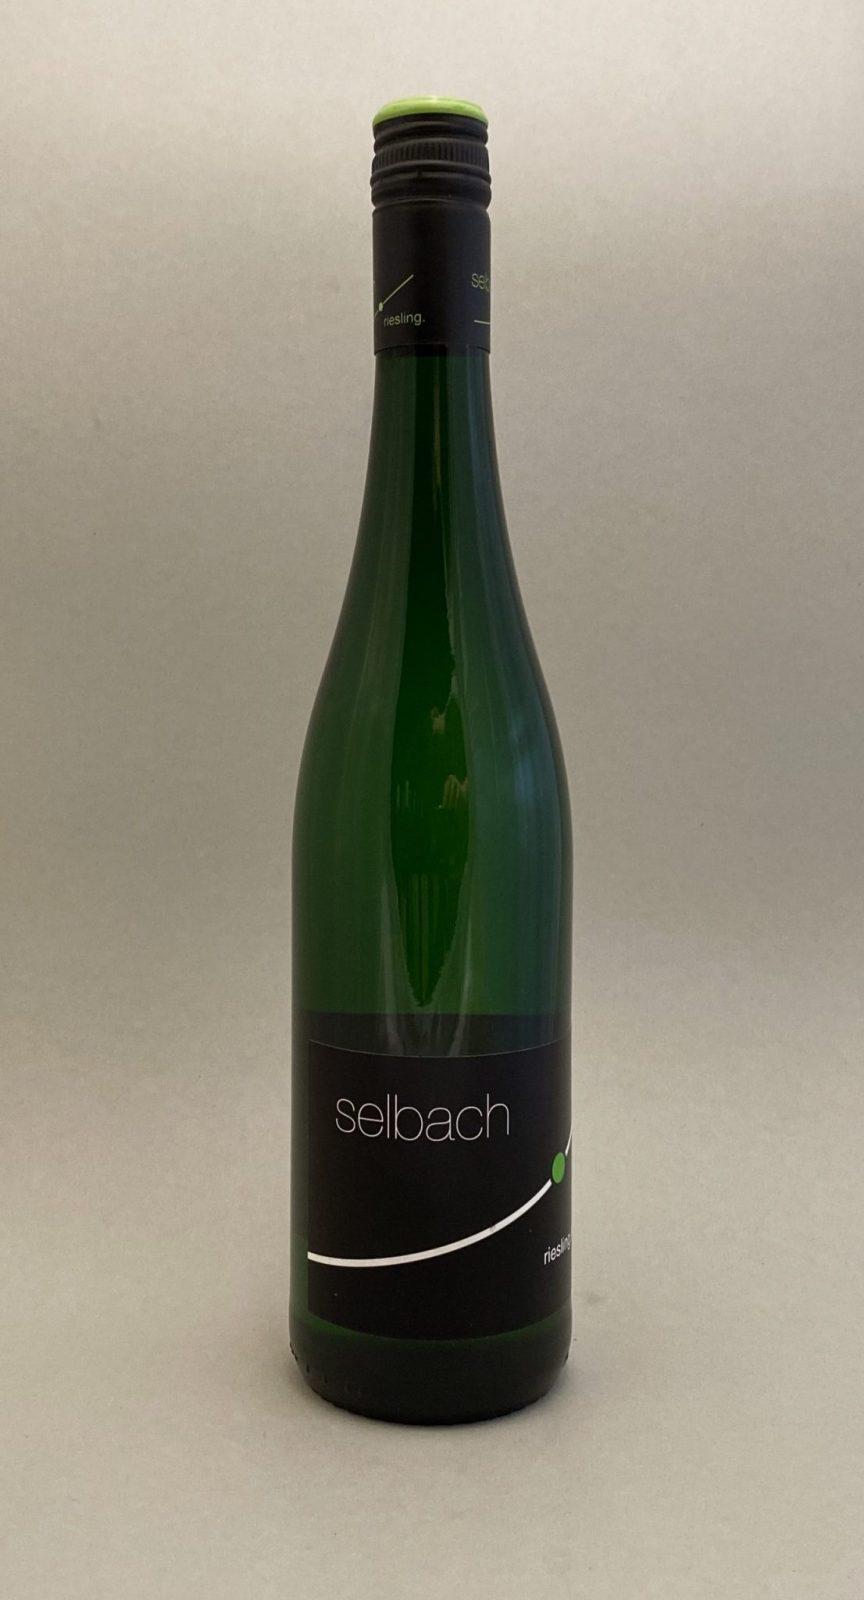 SELBACH Riesling Incline, vinoteka Bratislava Sunny wines slnecnice mesto, petrzalka, vino biele z Nemecka